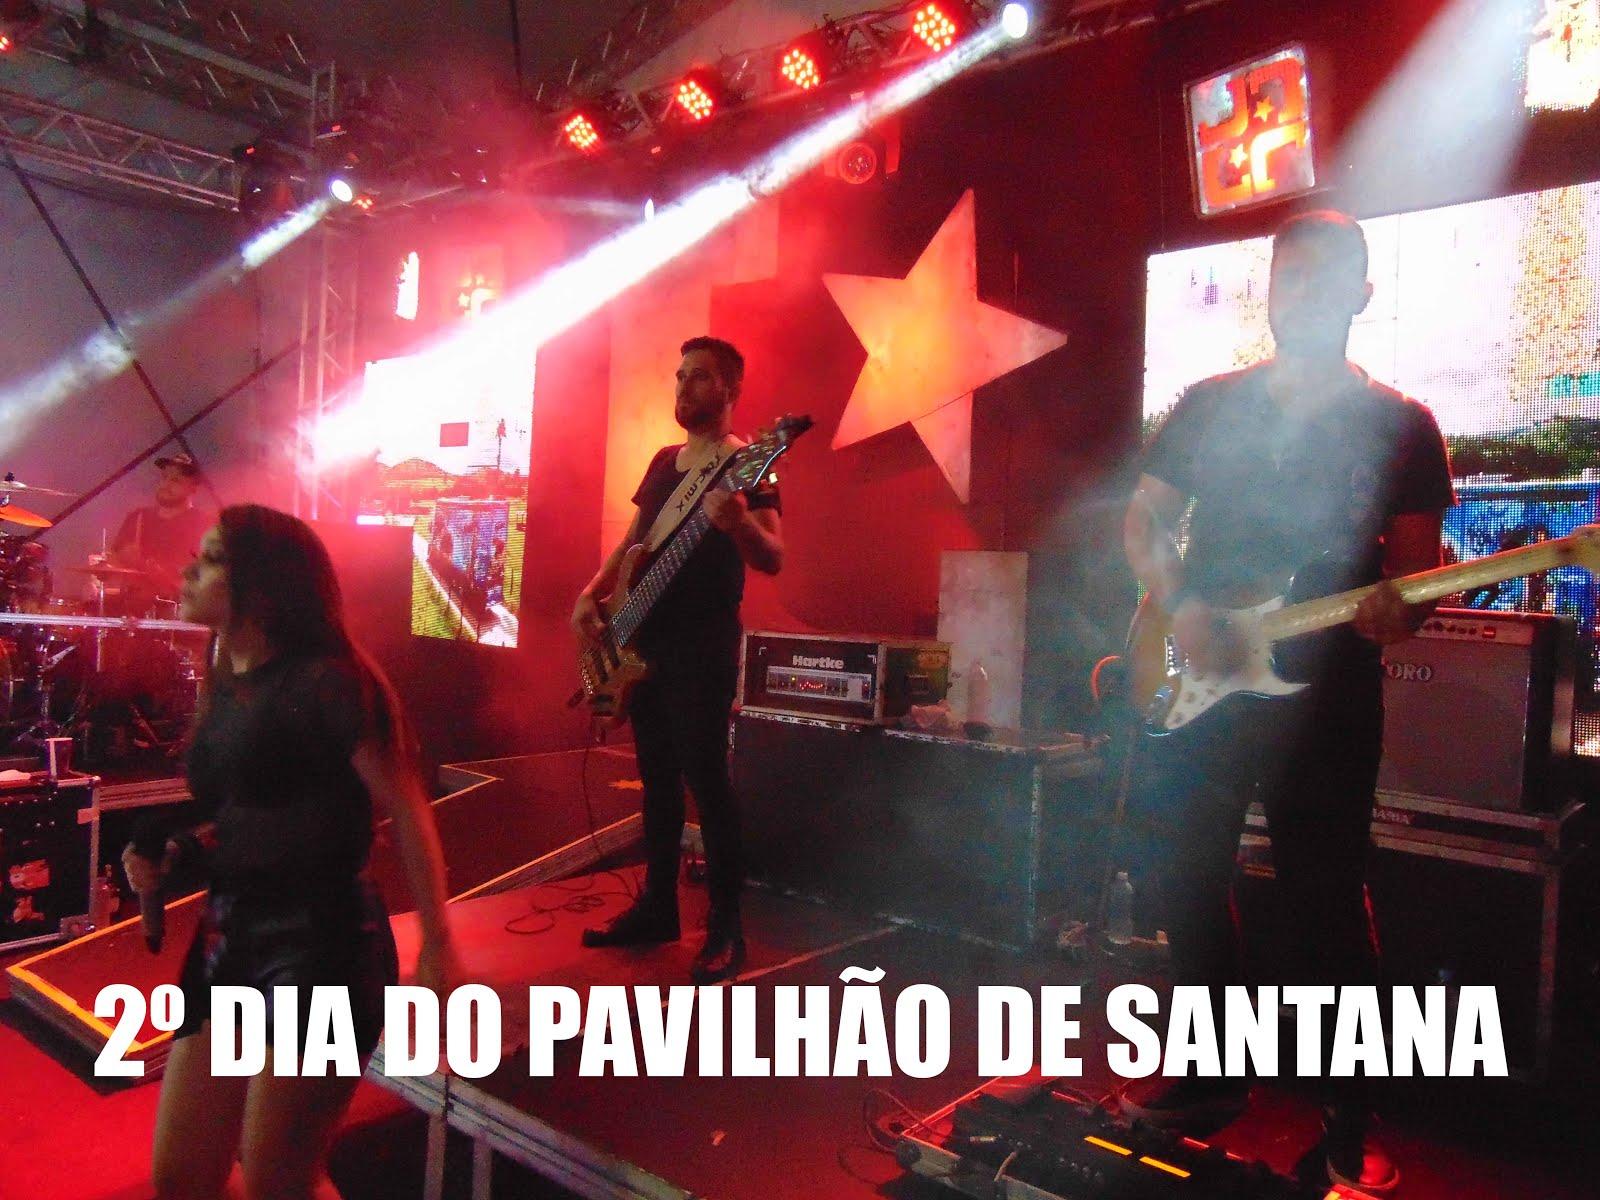 FESTA DE SANTANA 2019